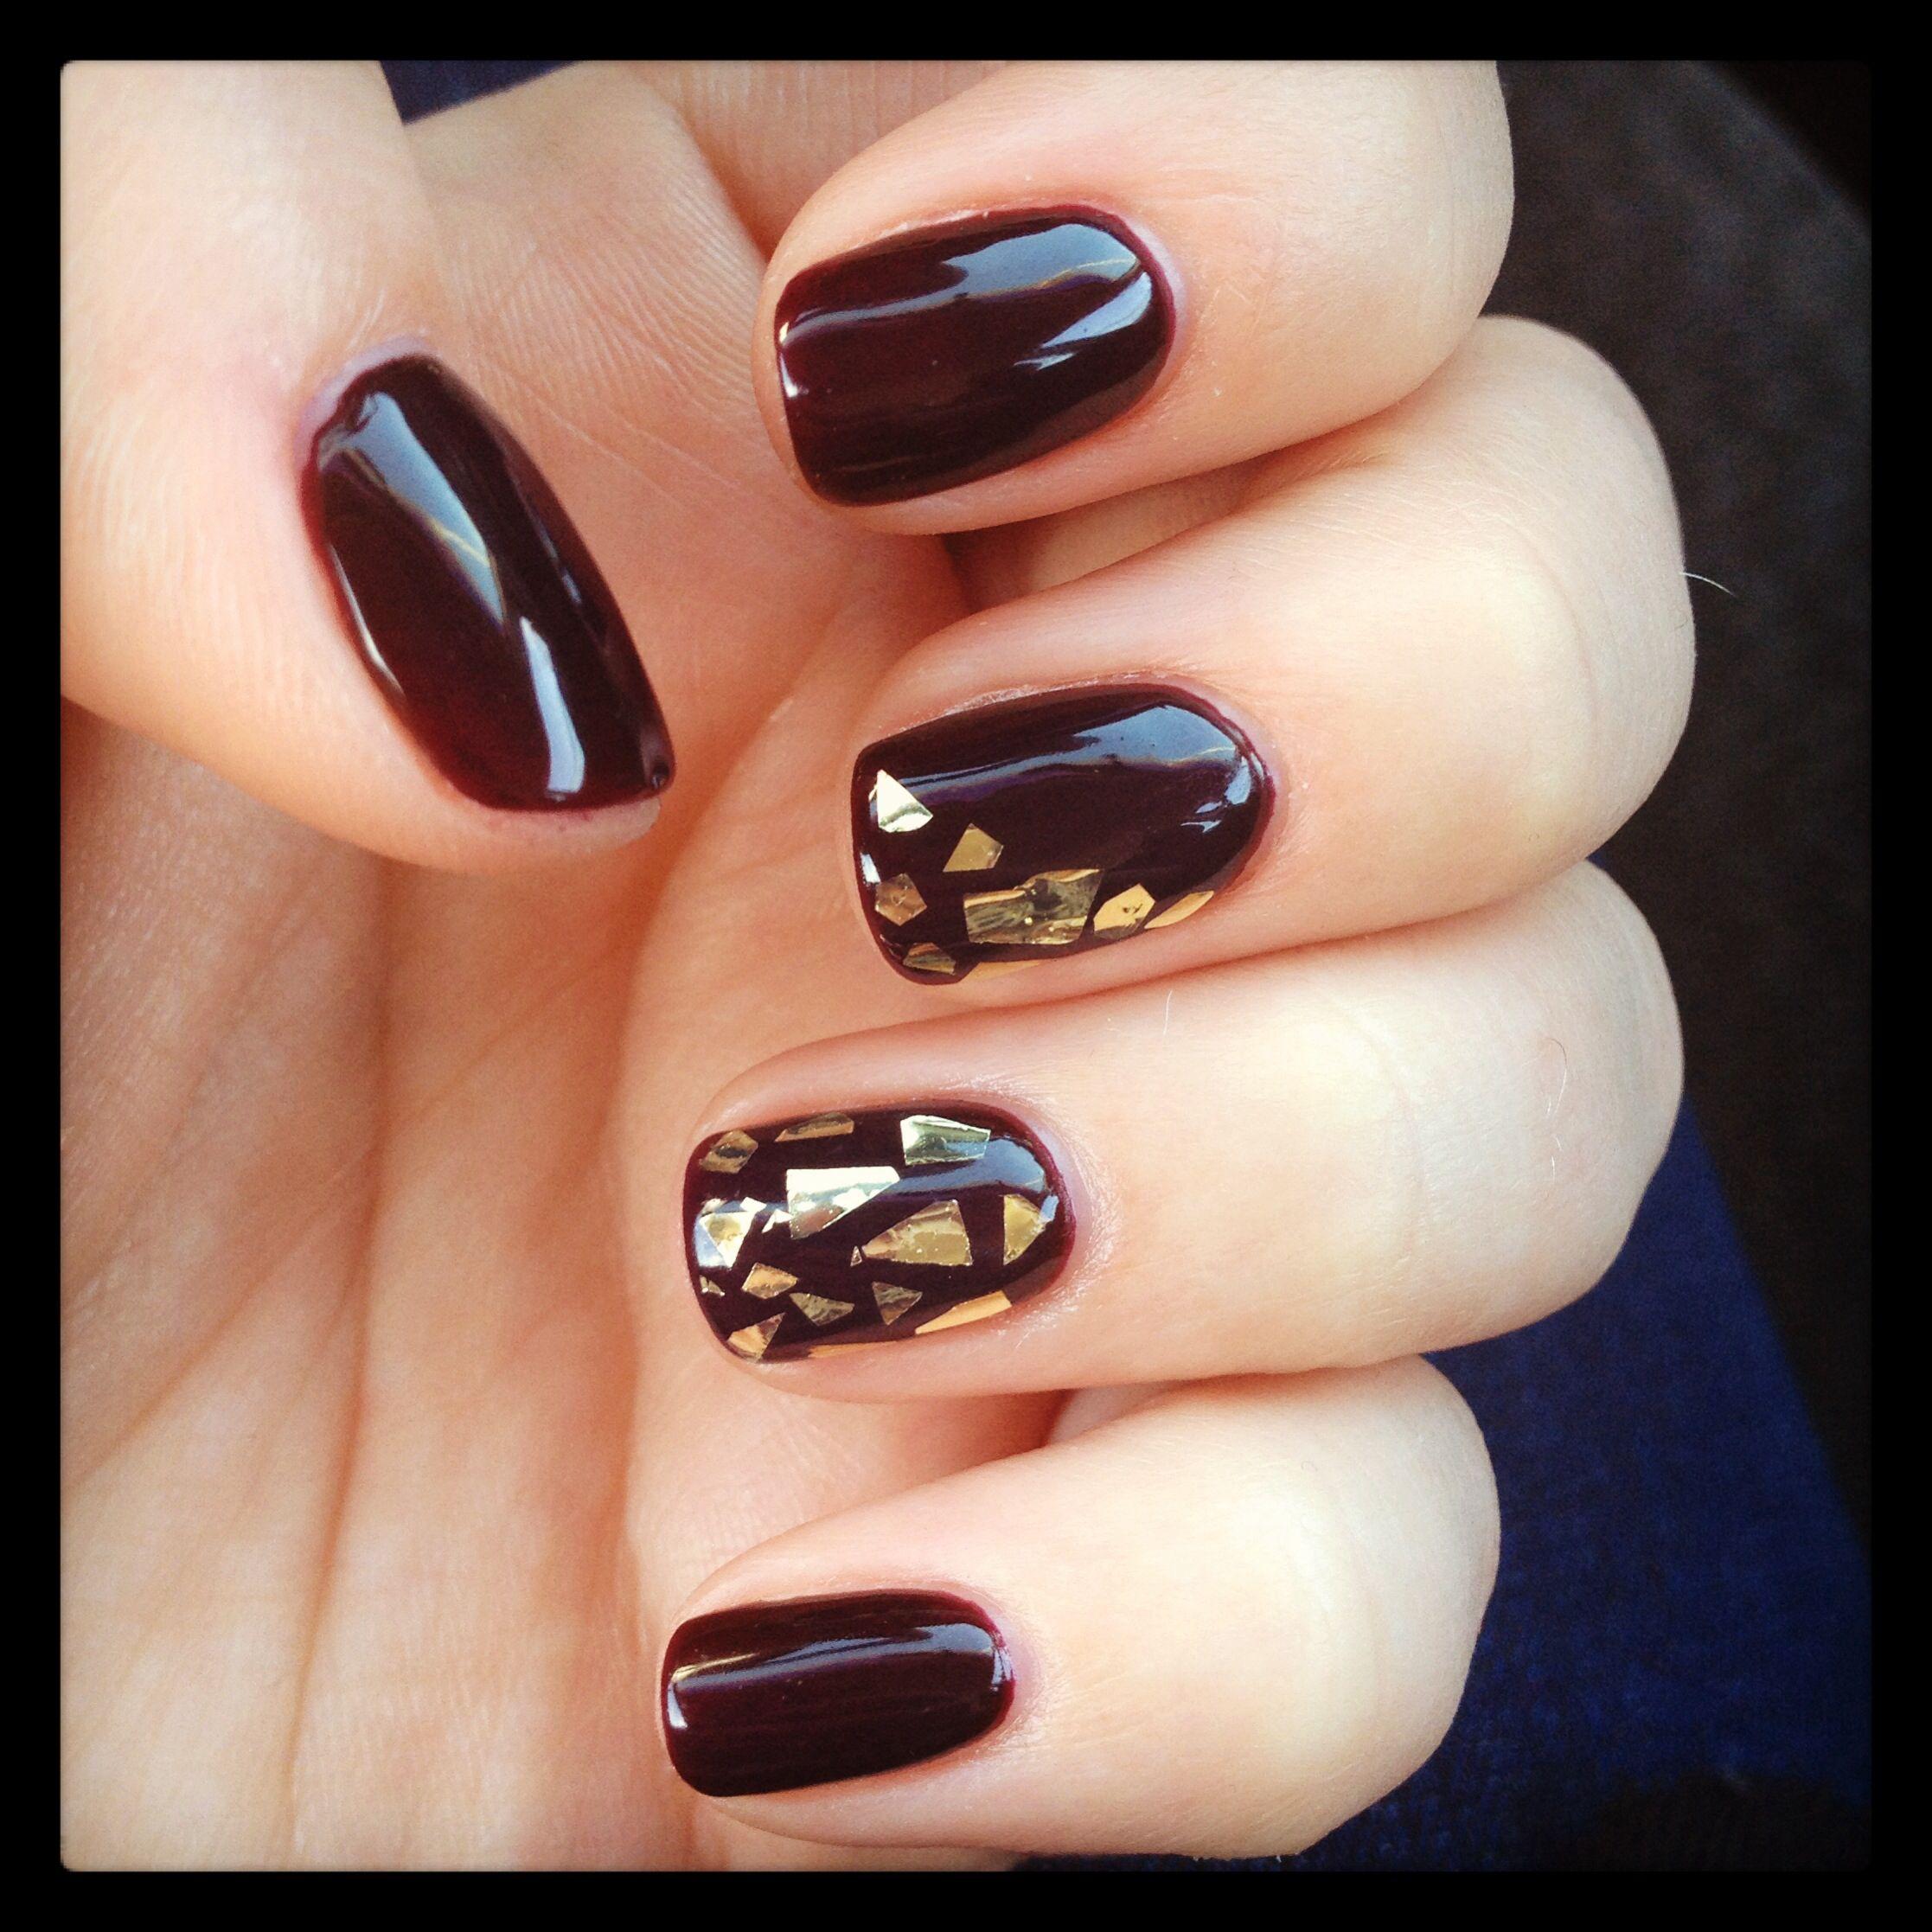 Marilyn Merlot Gel Polish Gold Flecks Glitter Fall Nails Pinkpolish In Chandler Az Lorcooperrider